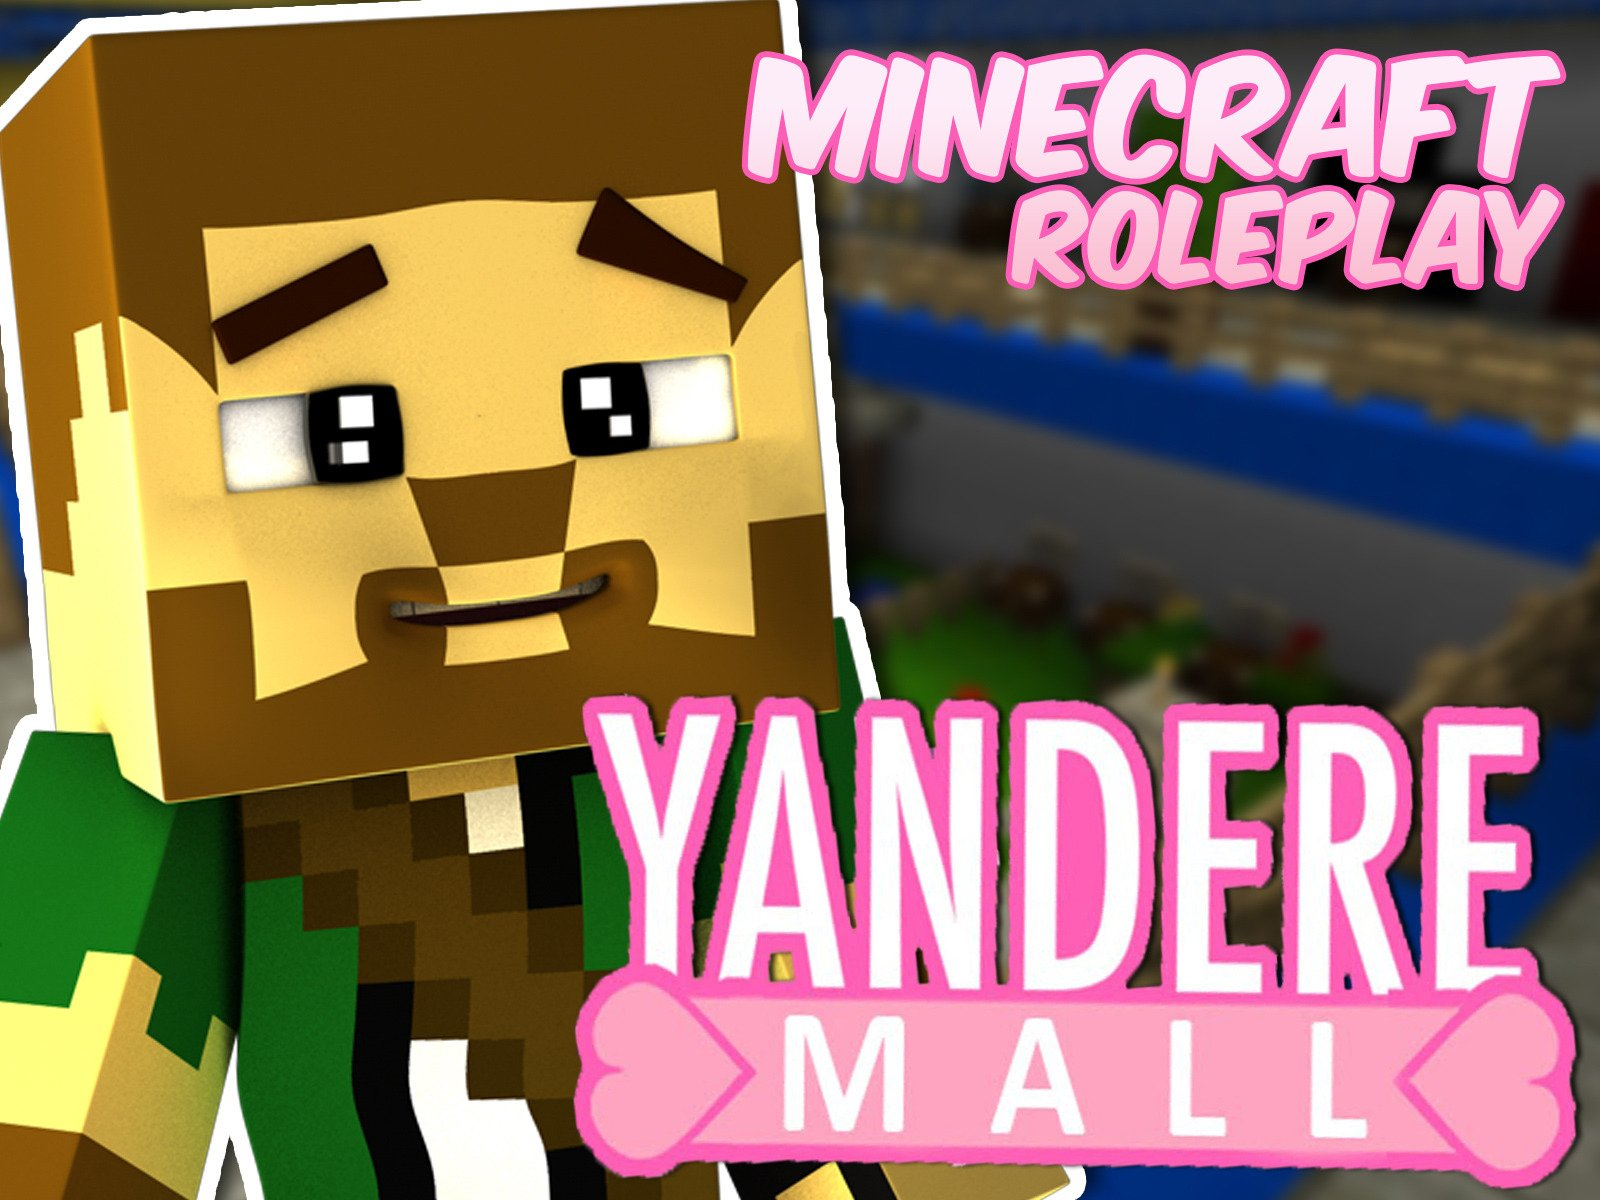 Yandere Mall (Minecraft Roleplay) - Season 1